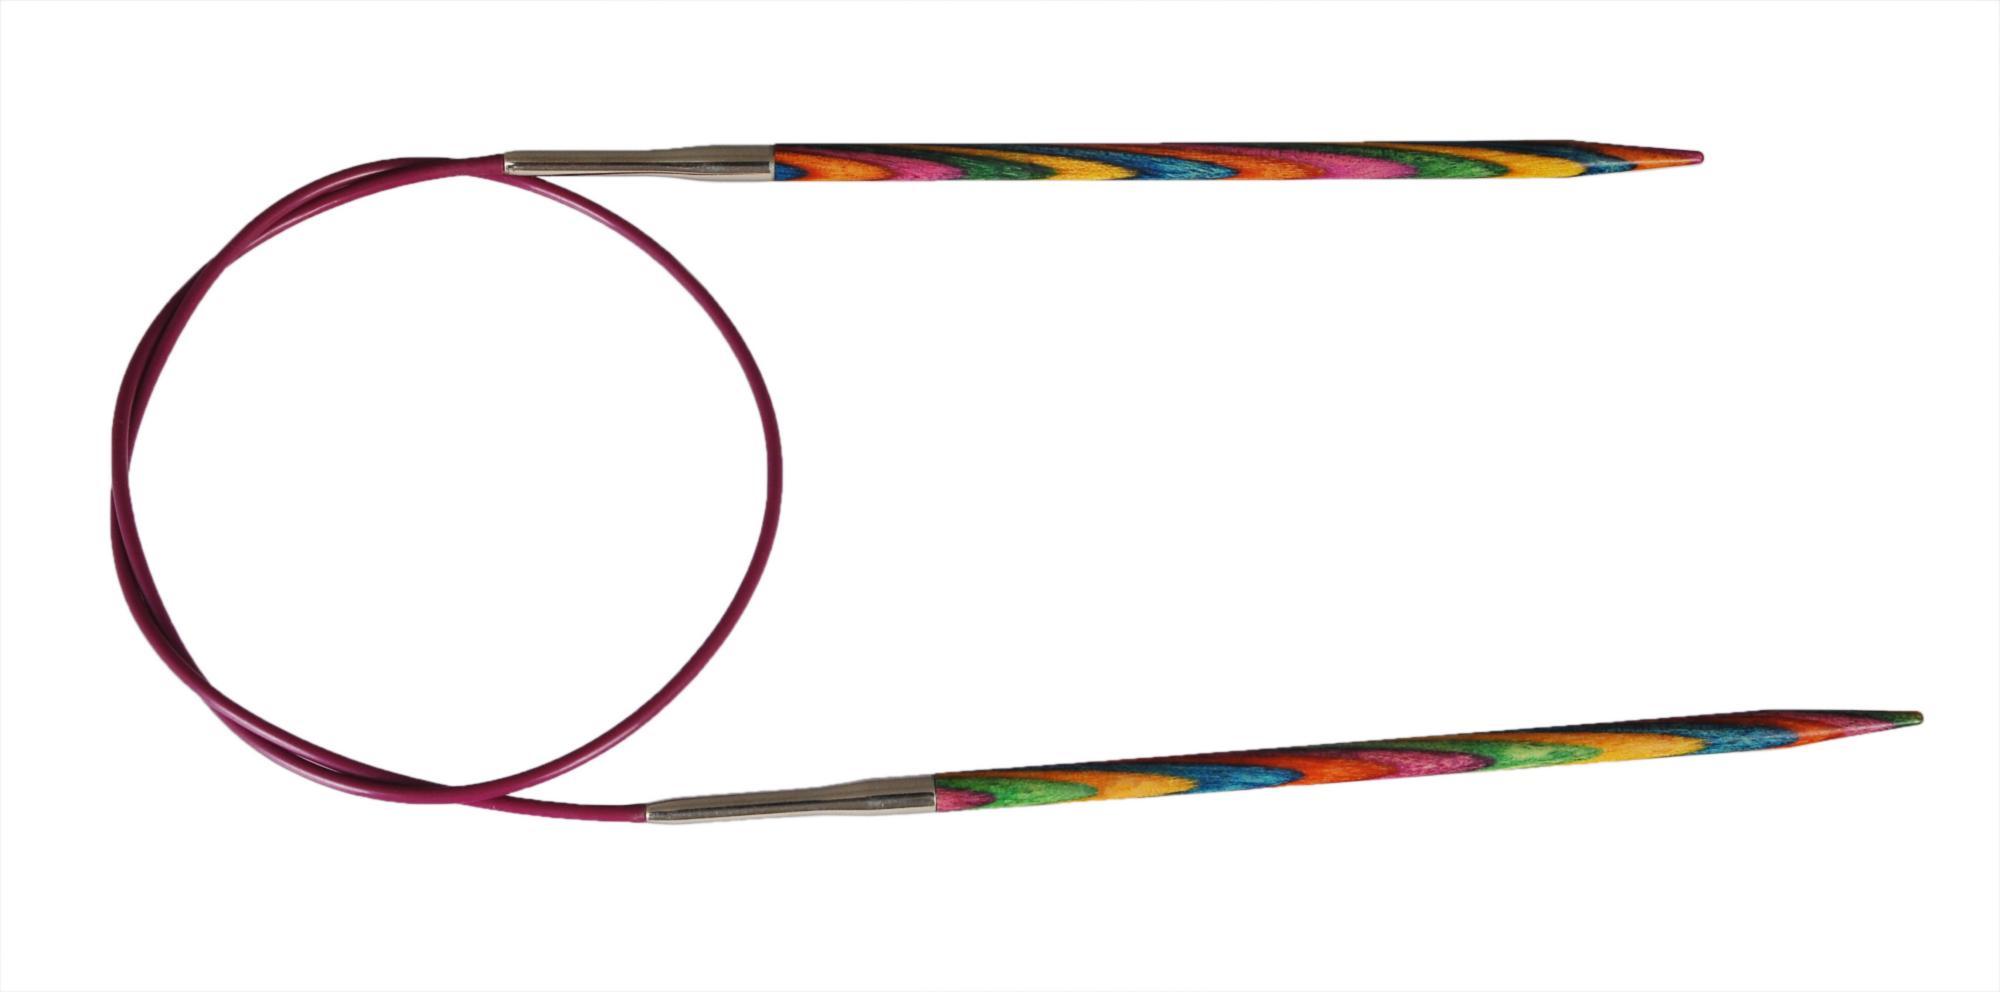 Спицы круговые 80 см Symfonie Wood KnitPro, 21340, 5.50 мм